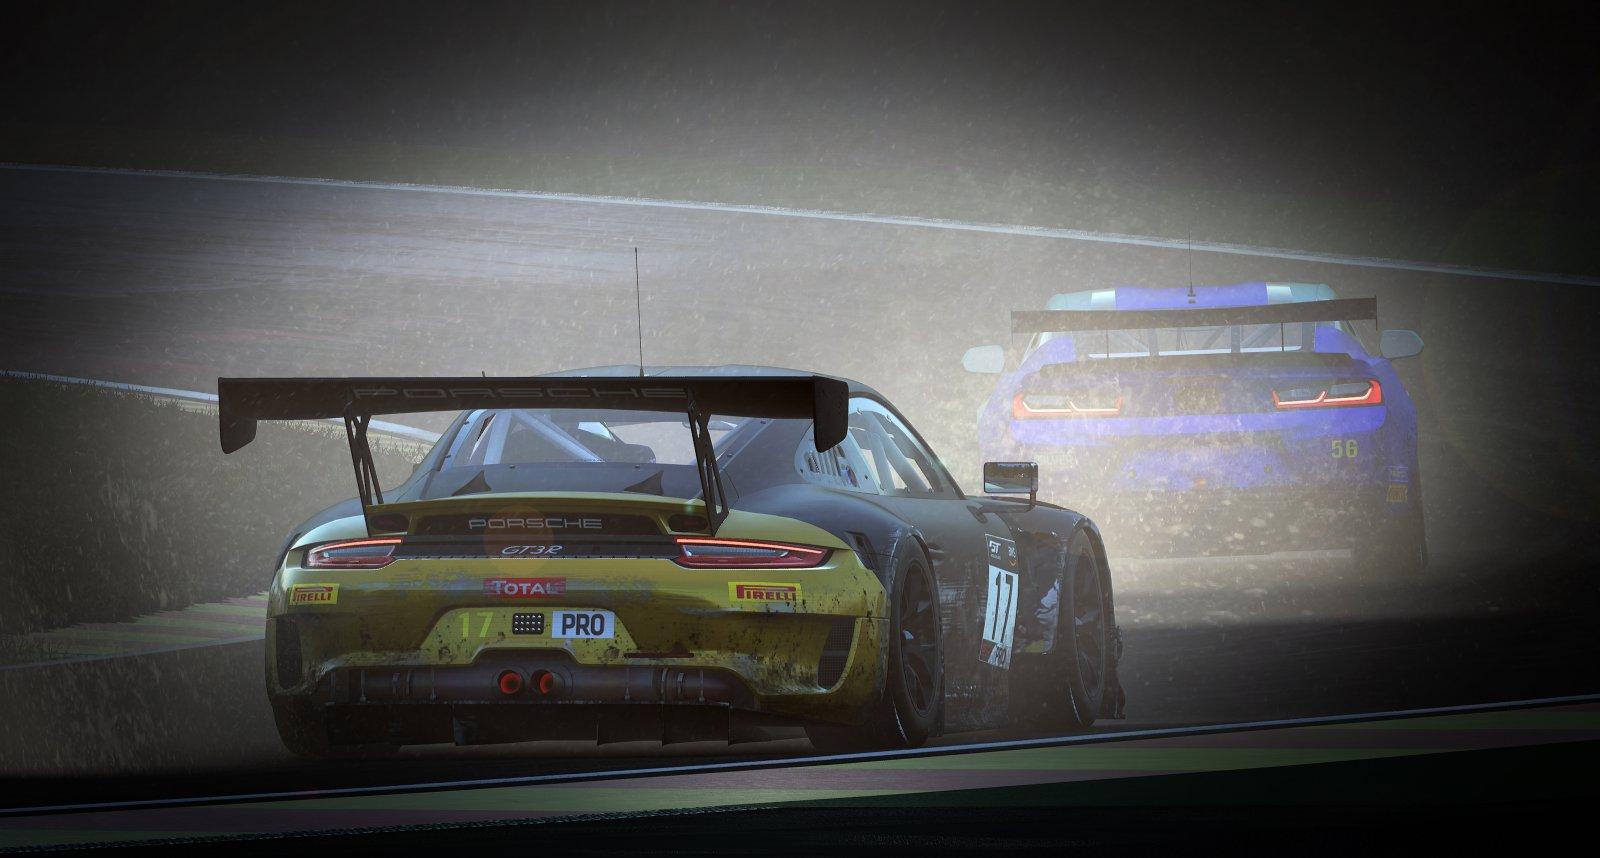 Assetto Corsa Competizione Screenshot 2020.11.14 - 20.07.33.13.jpg